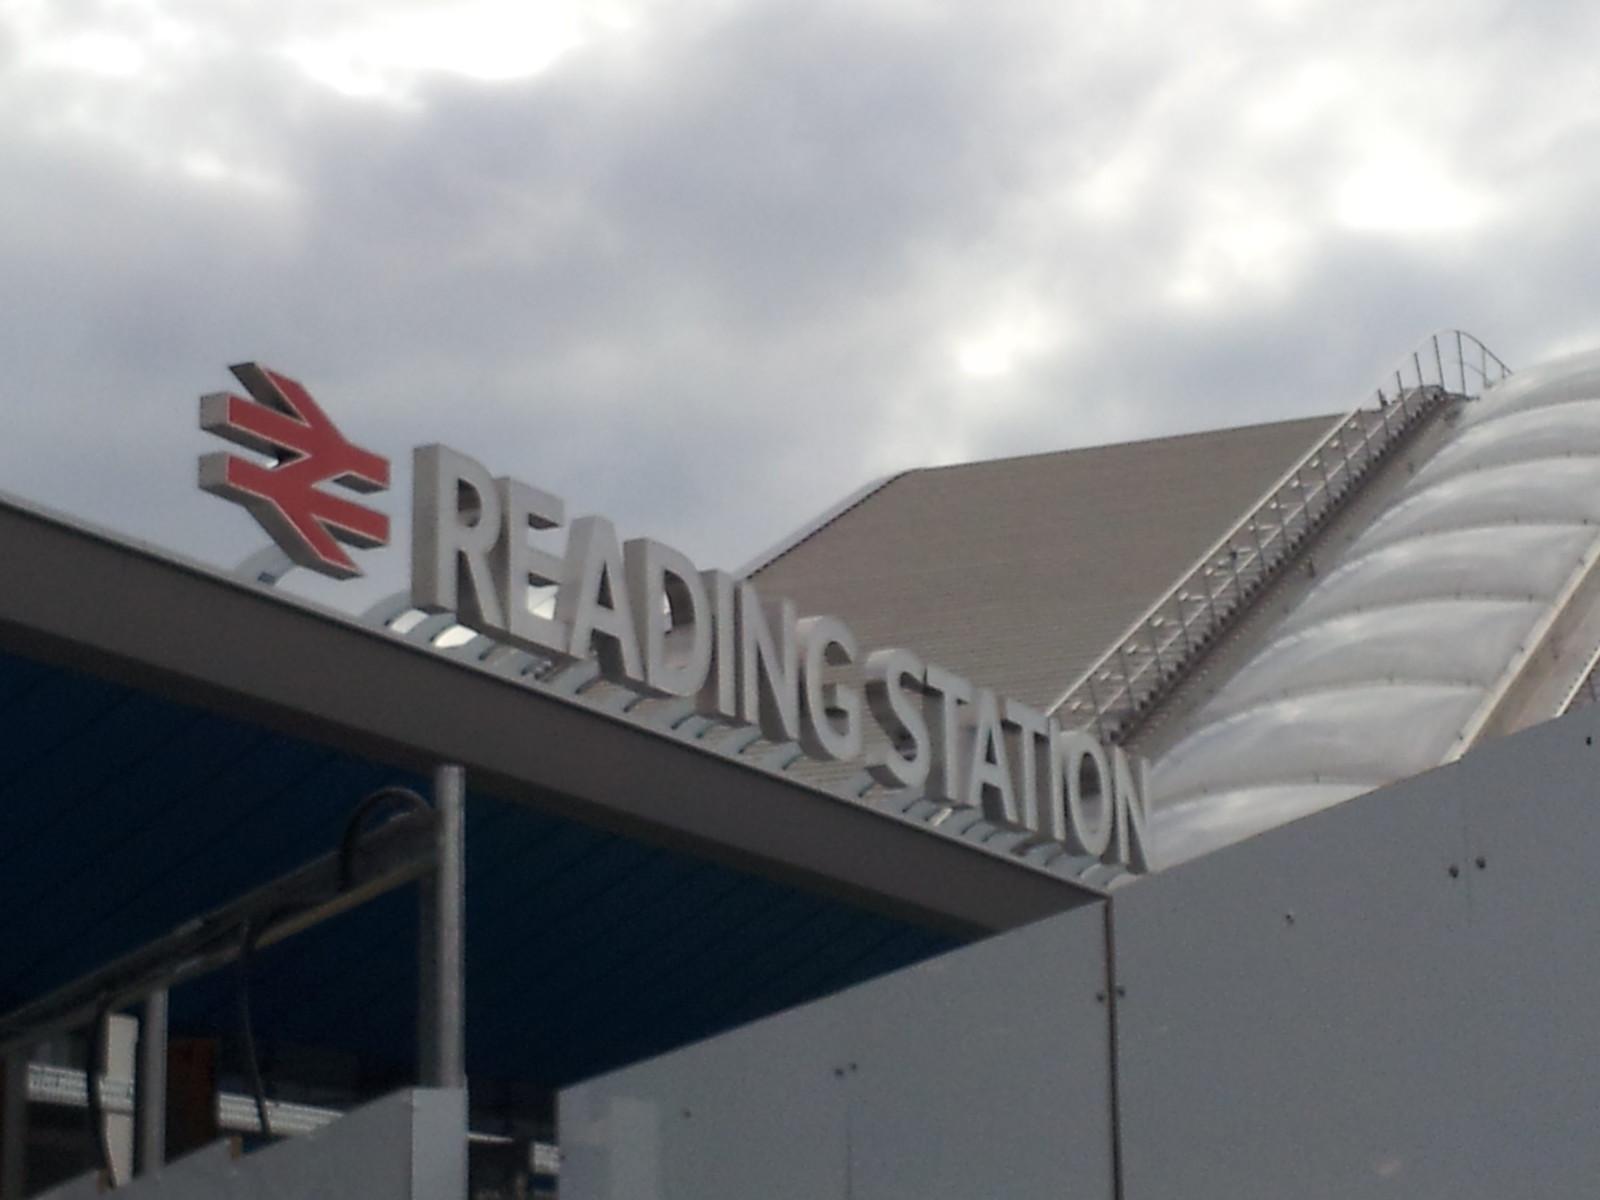 Reading Station Redevelopment